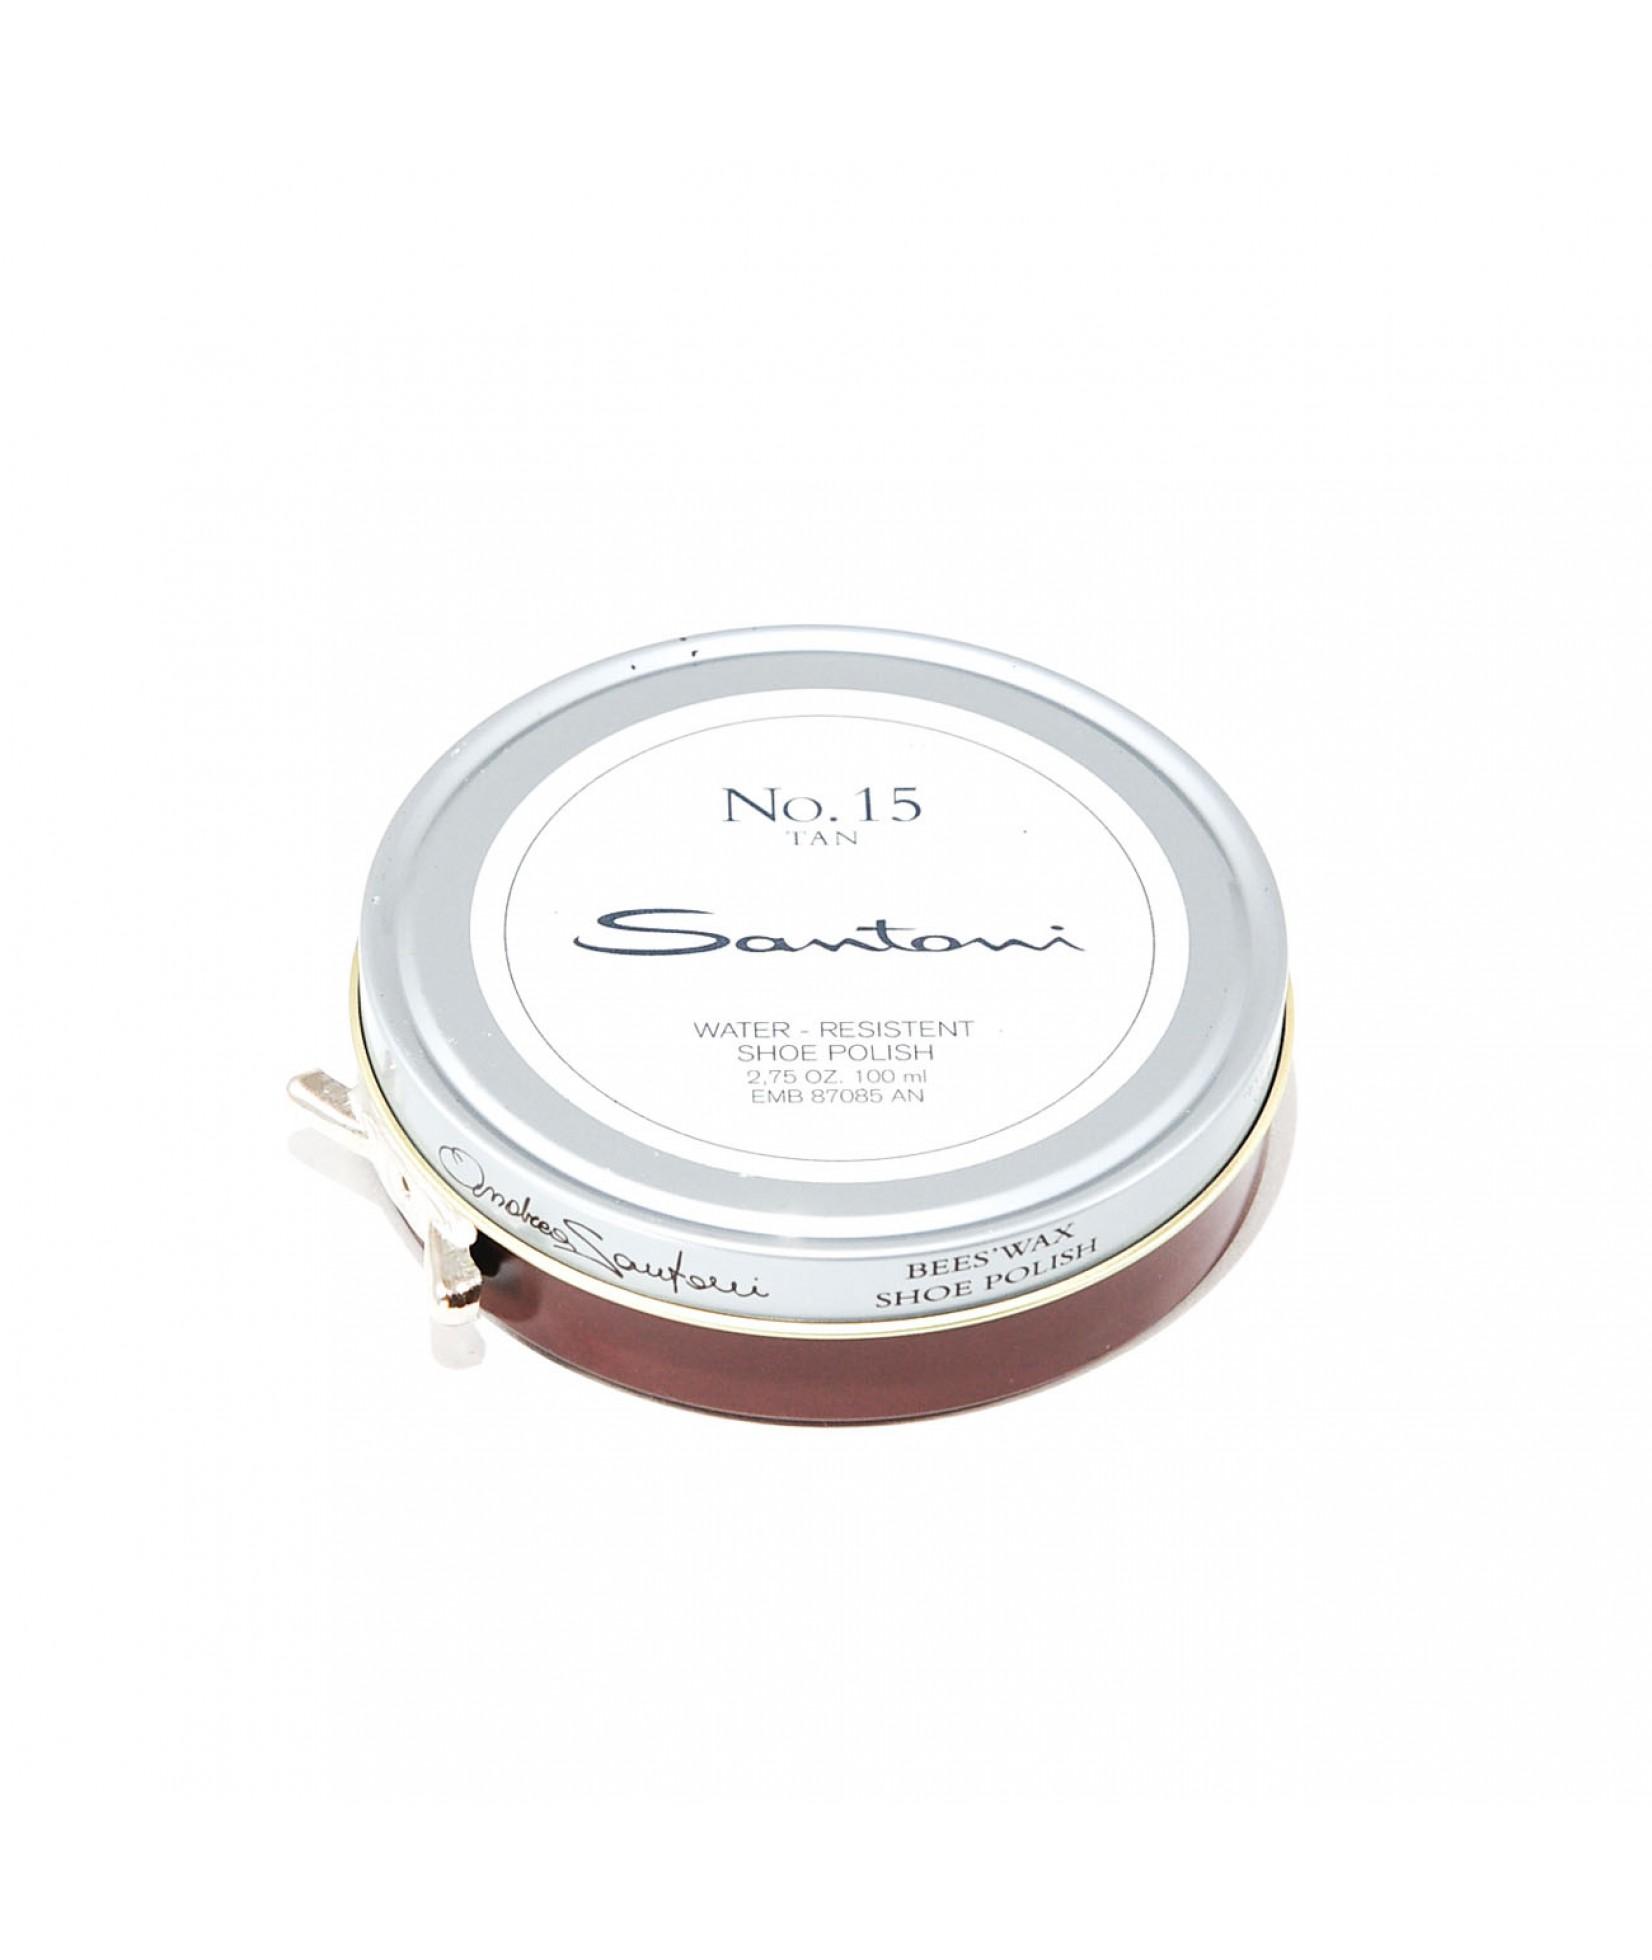 Santoni 蜂蜡鞋油 (干邑鞋油)